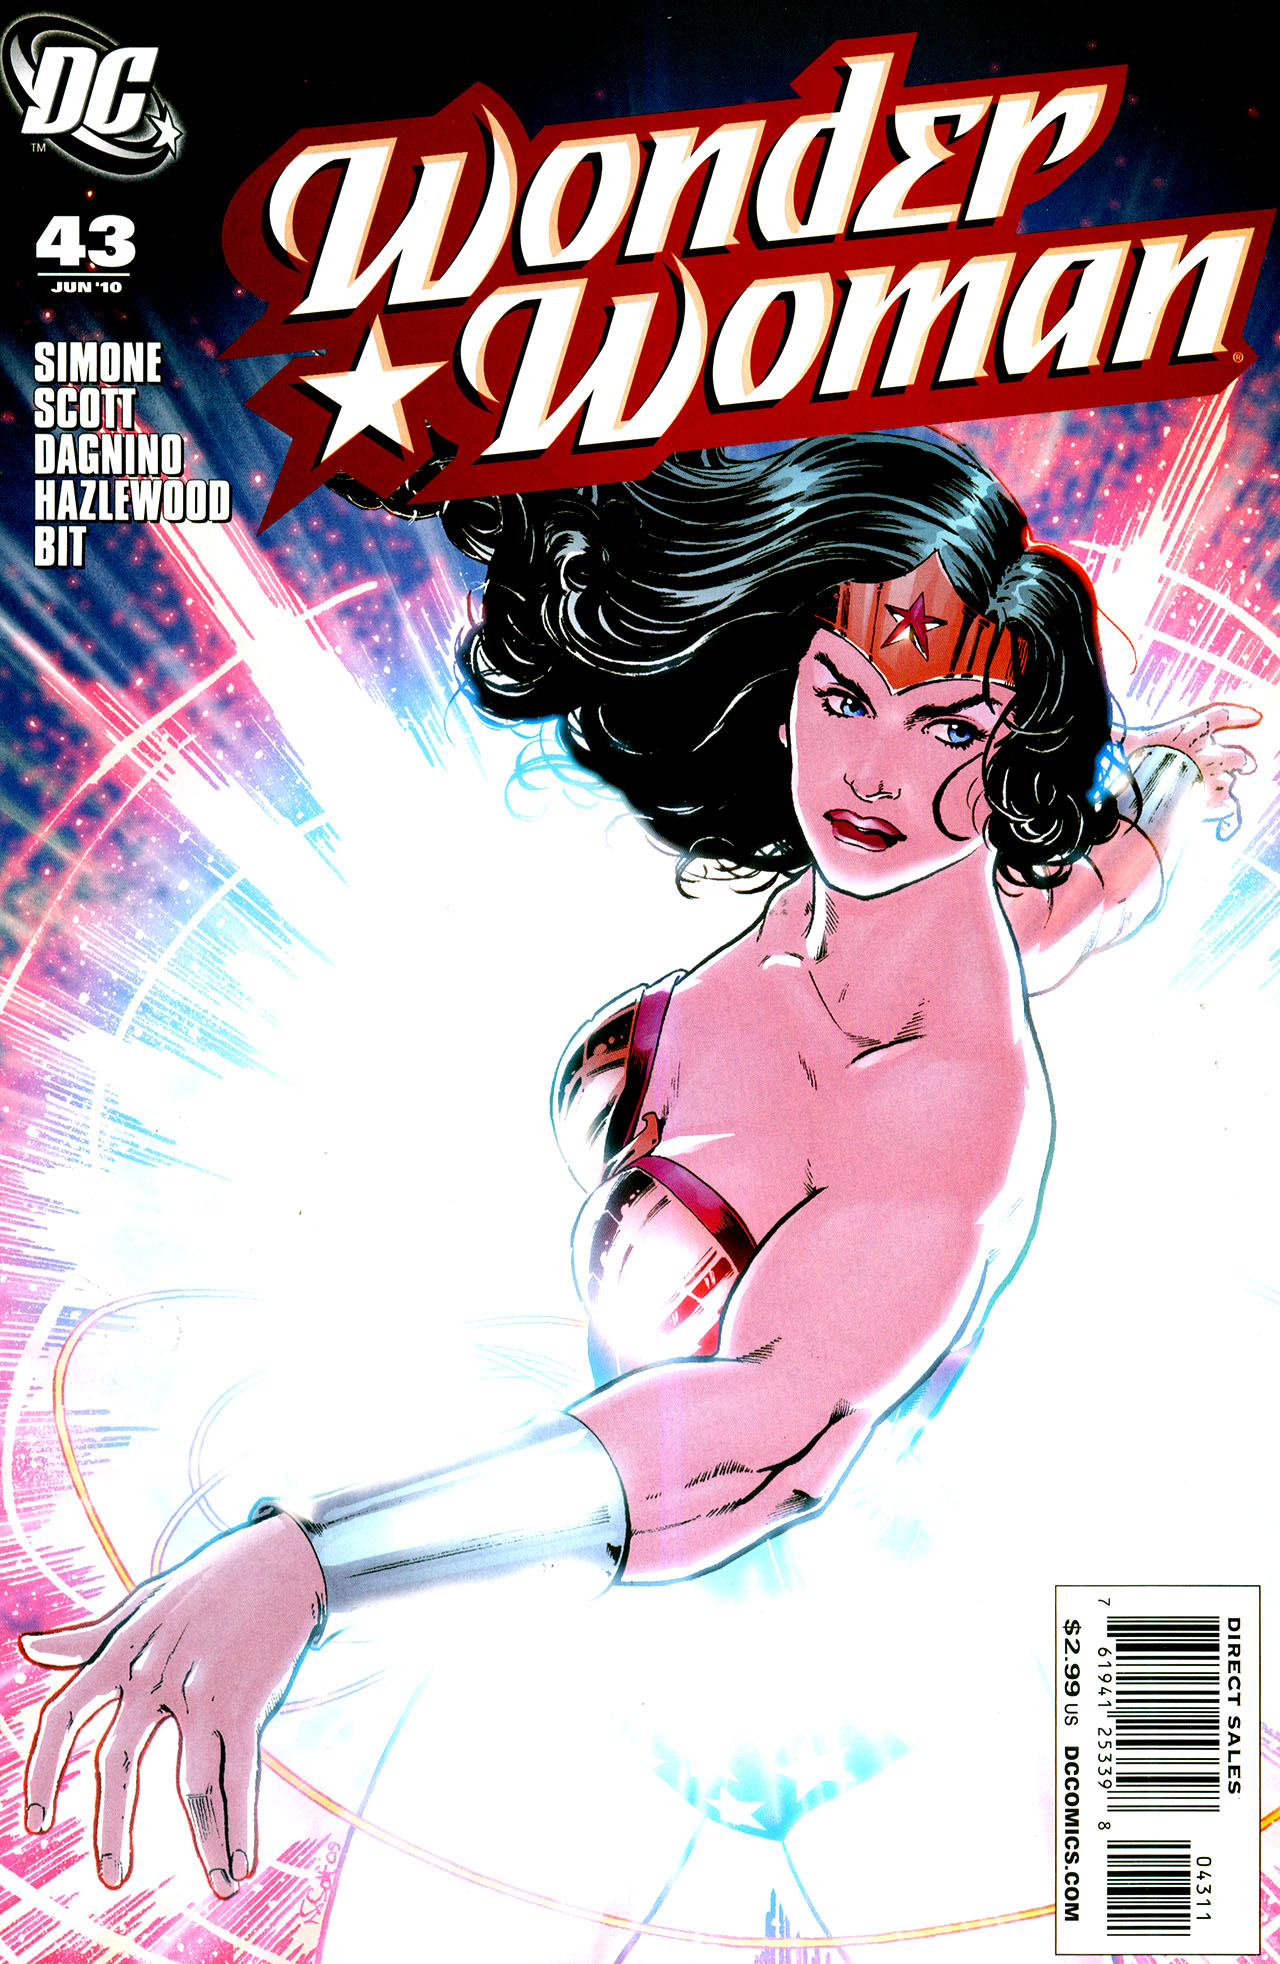 Read online Wonder Woman (2006) comic -  Issue #43 - 1